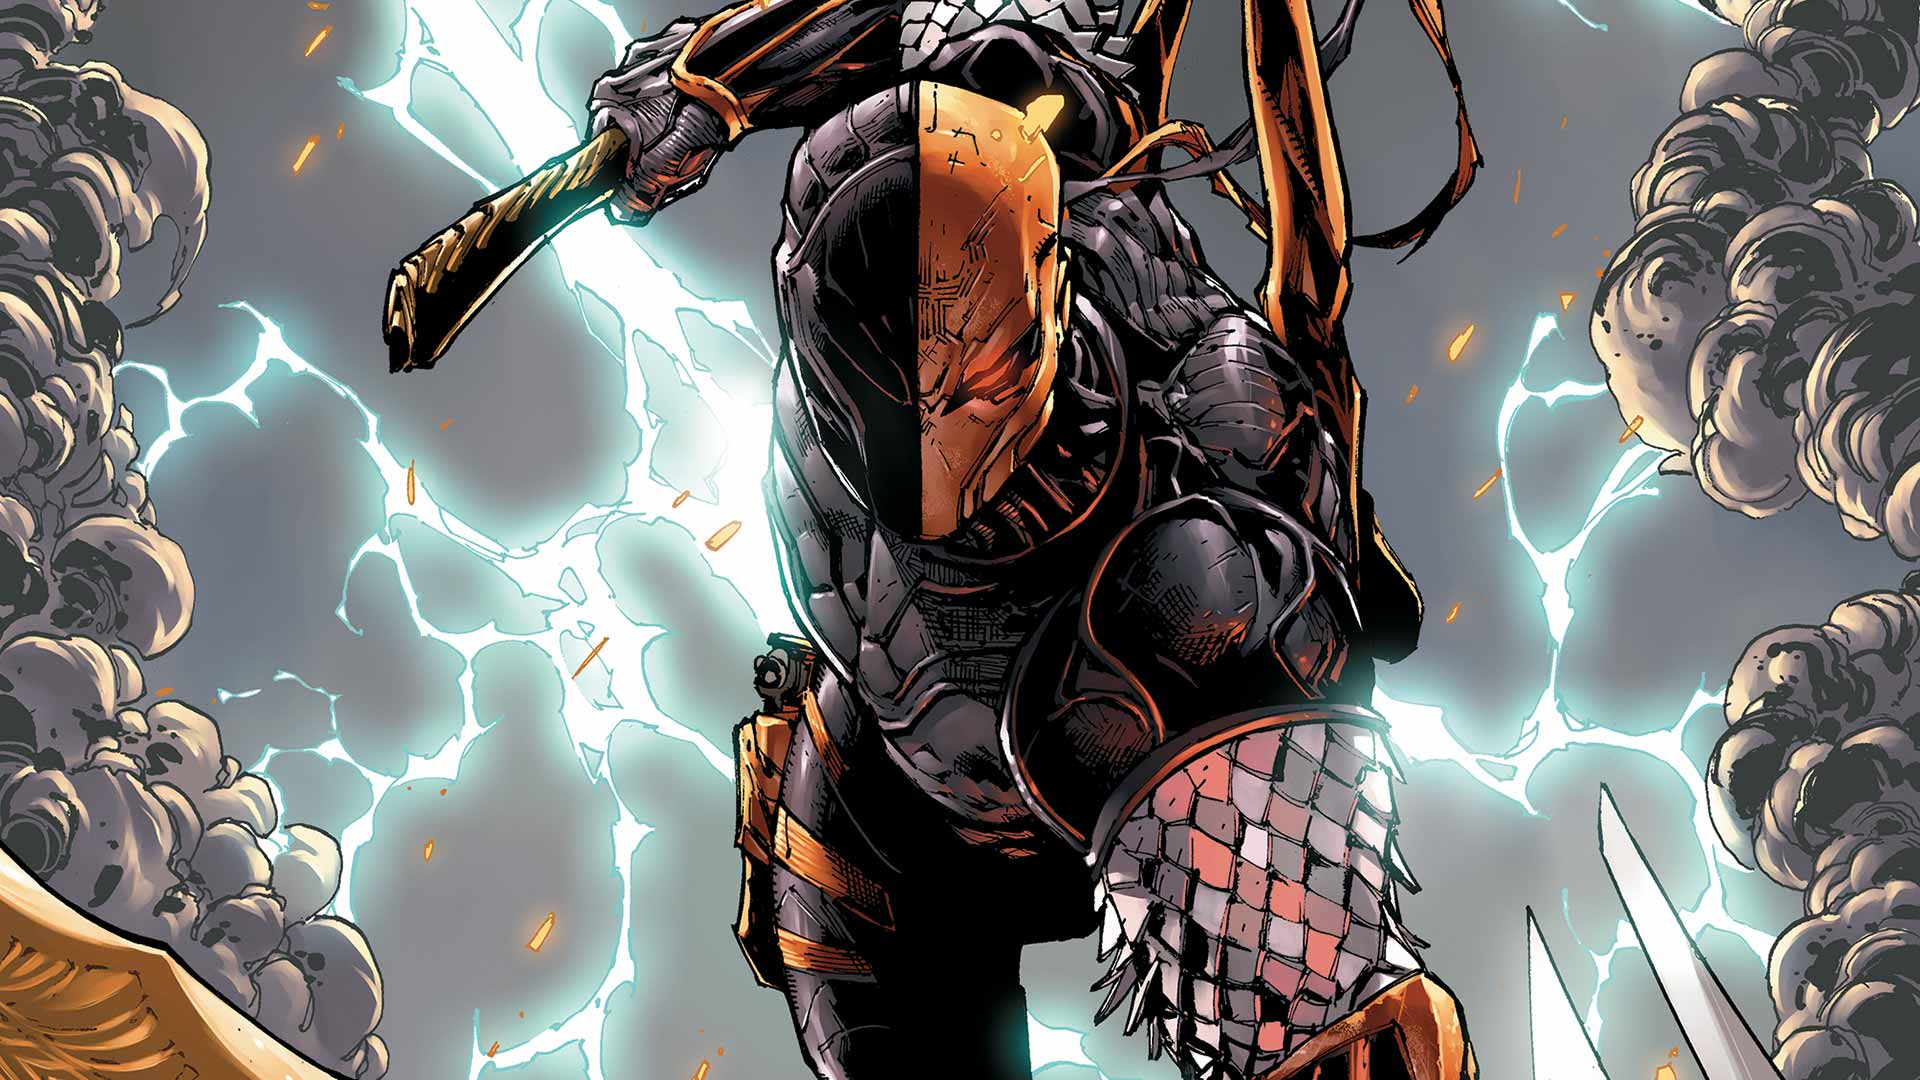 Descubre el top 4 de mejores antihéroes de DC comics - deathstroke